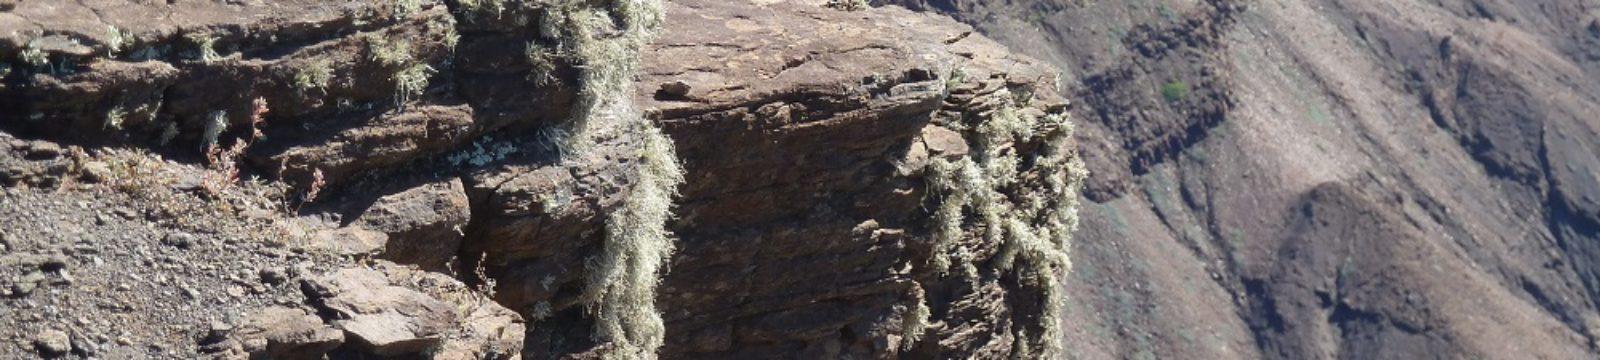 Photo of Cliffs at Prosperous Bay Plain